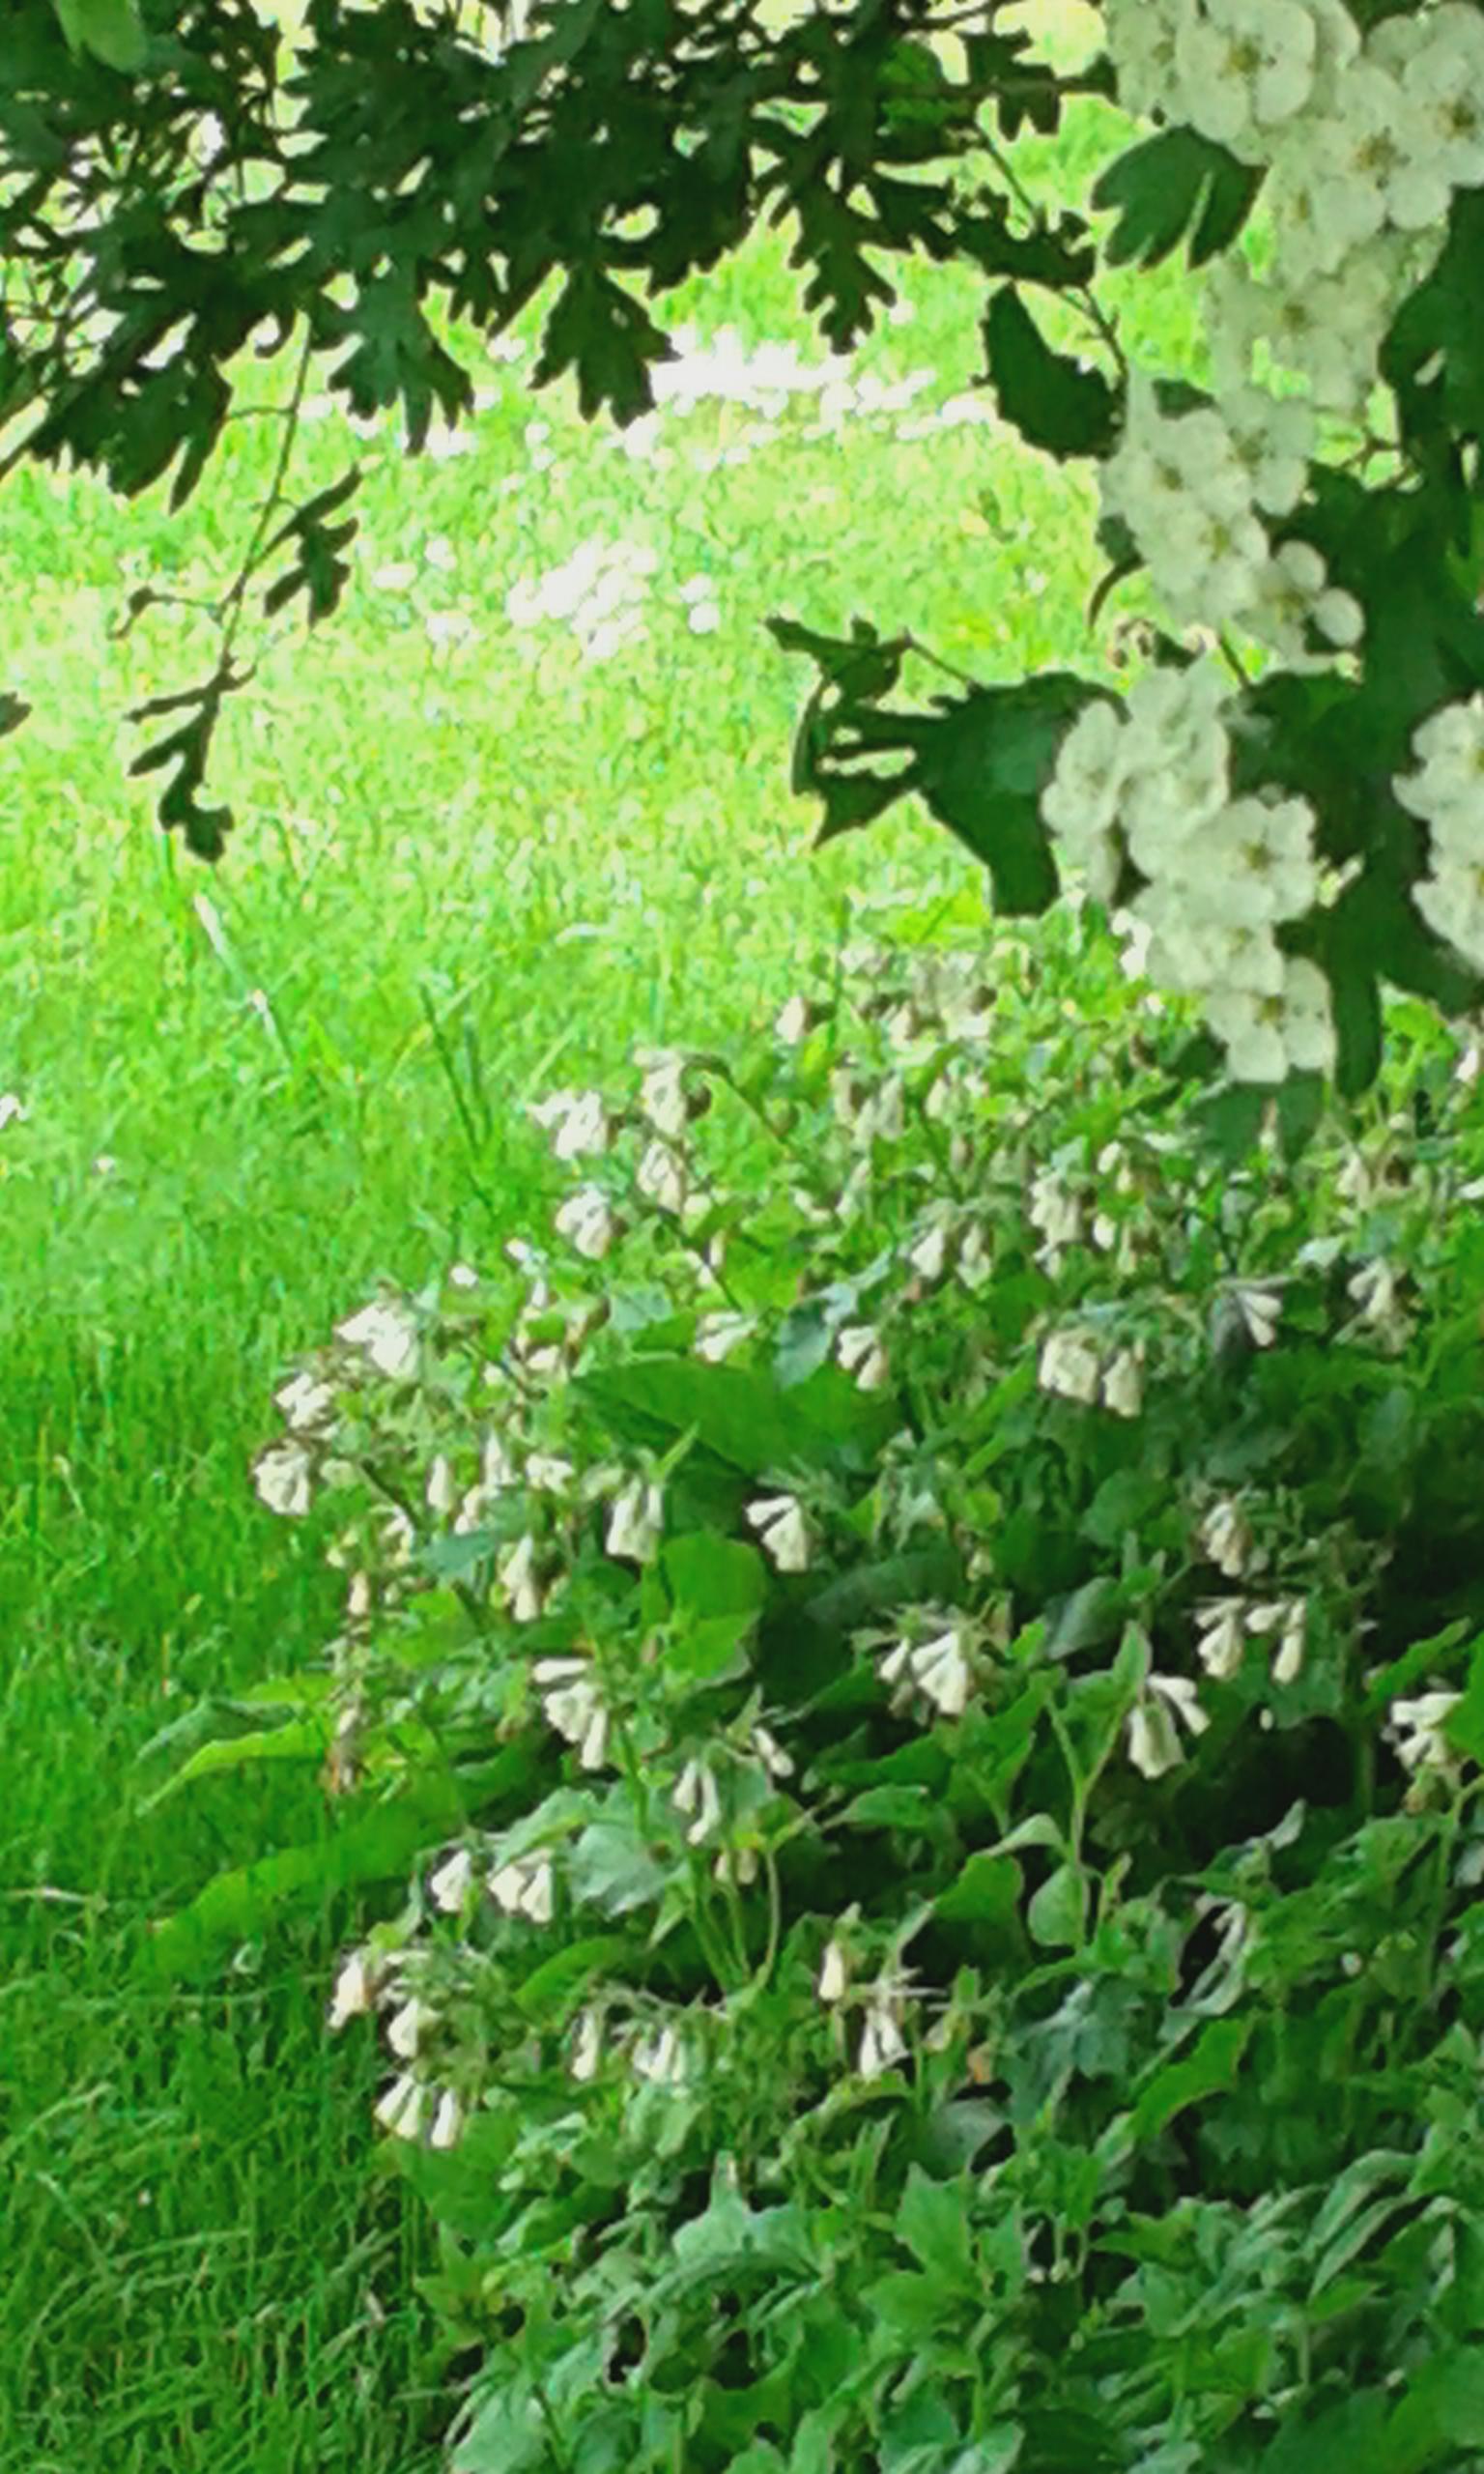 Frühlingslied - Foto von Liane Fehler